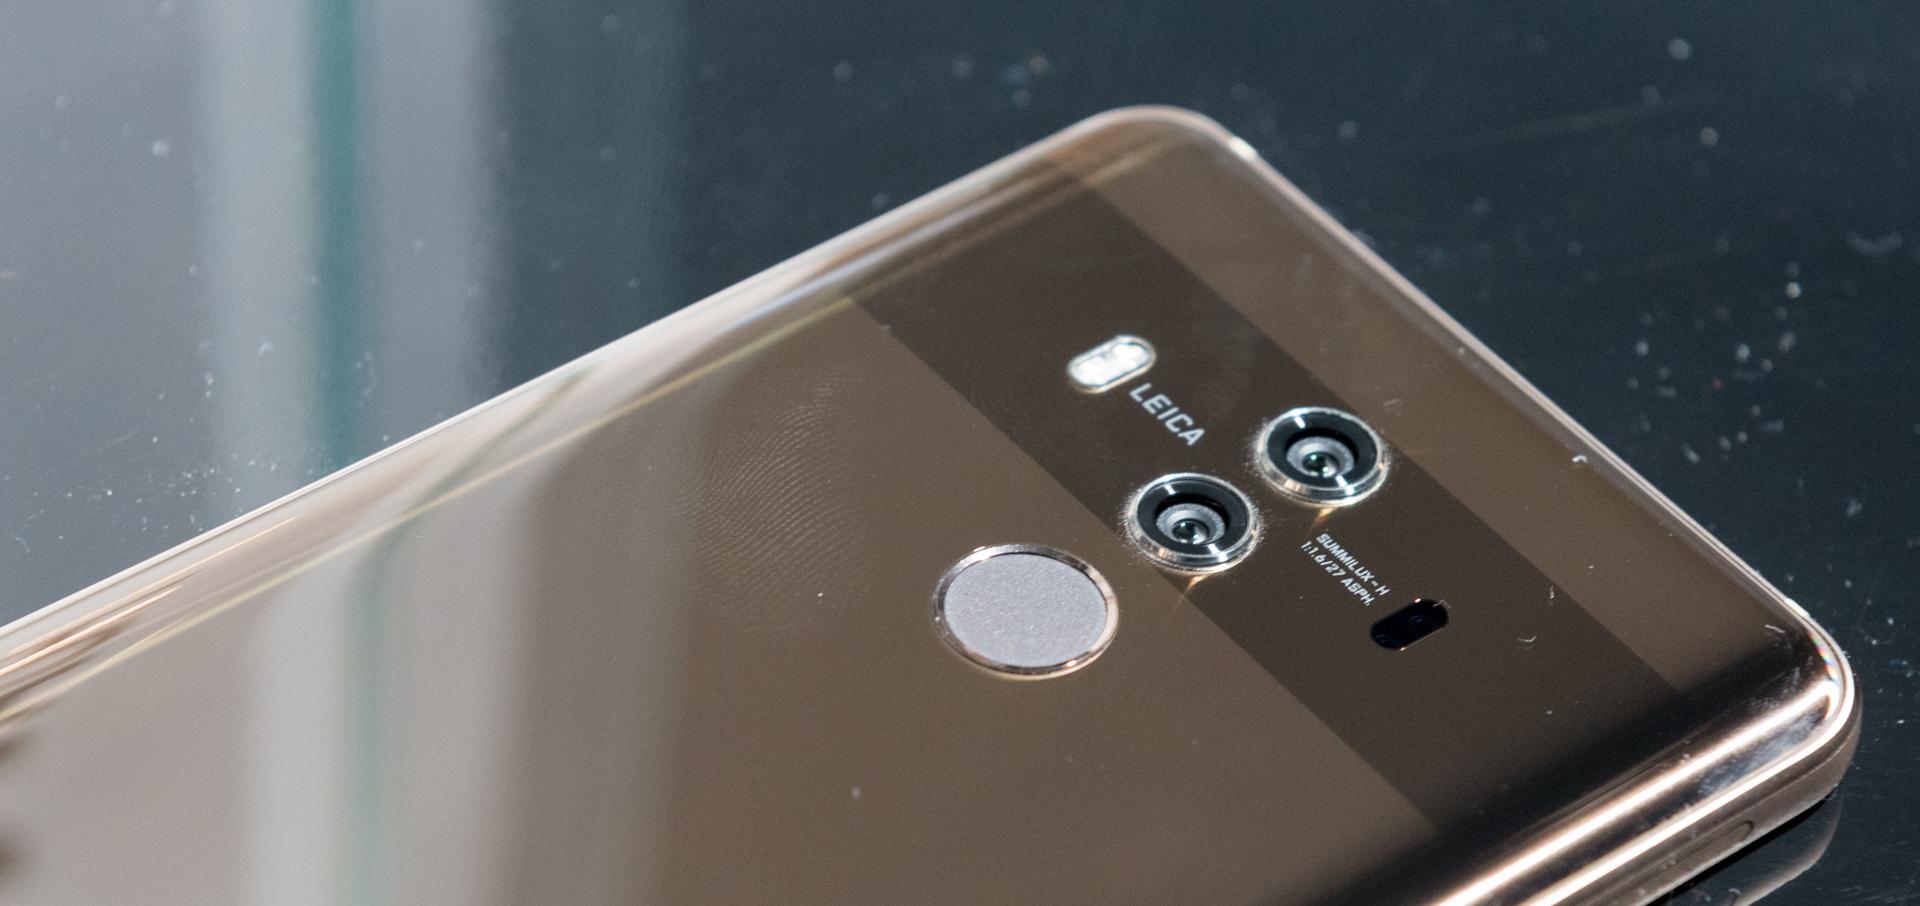 Fotocamere posteriori Huawei Mate 10 Pro